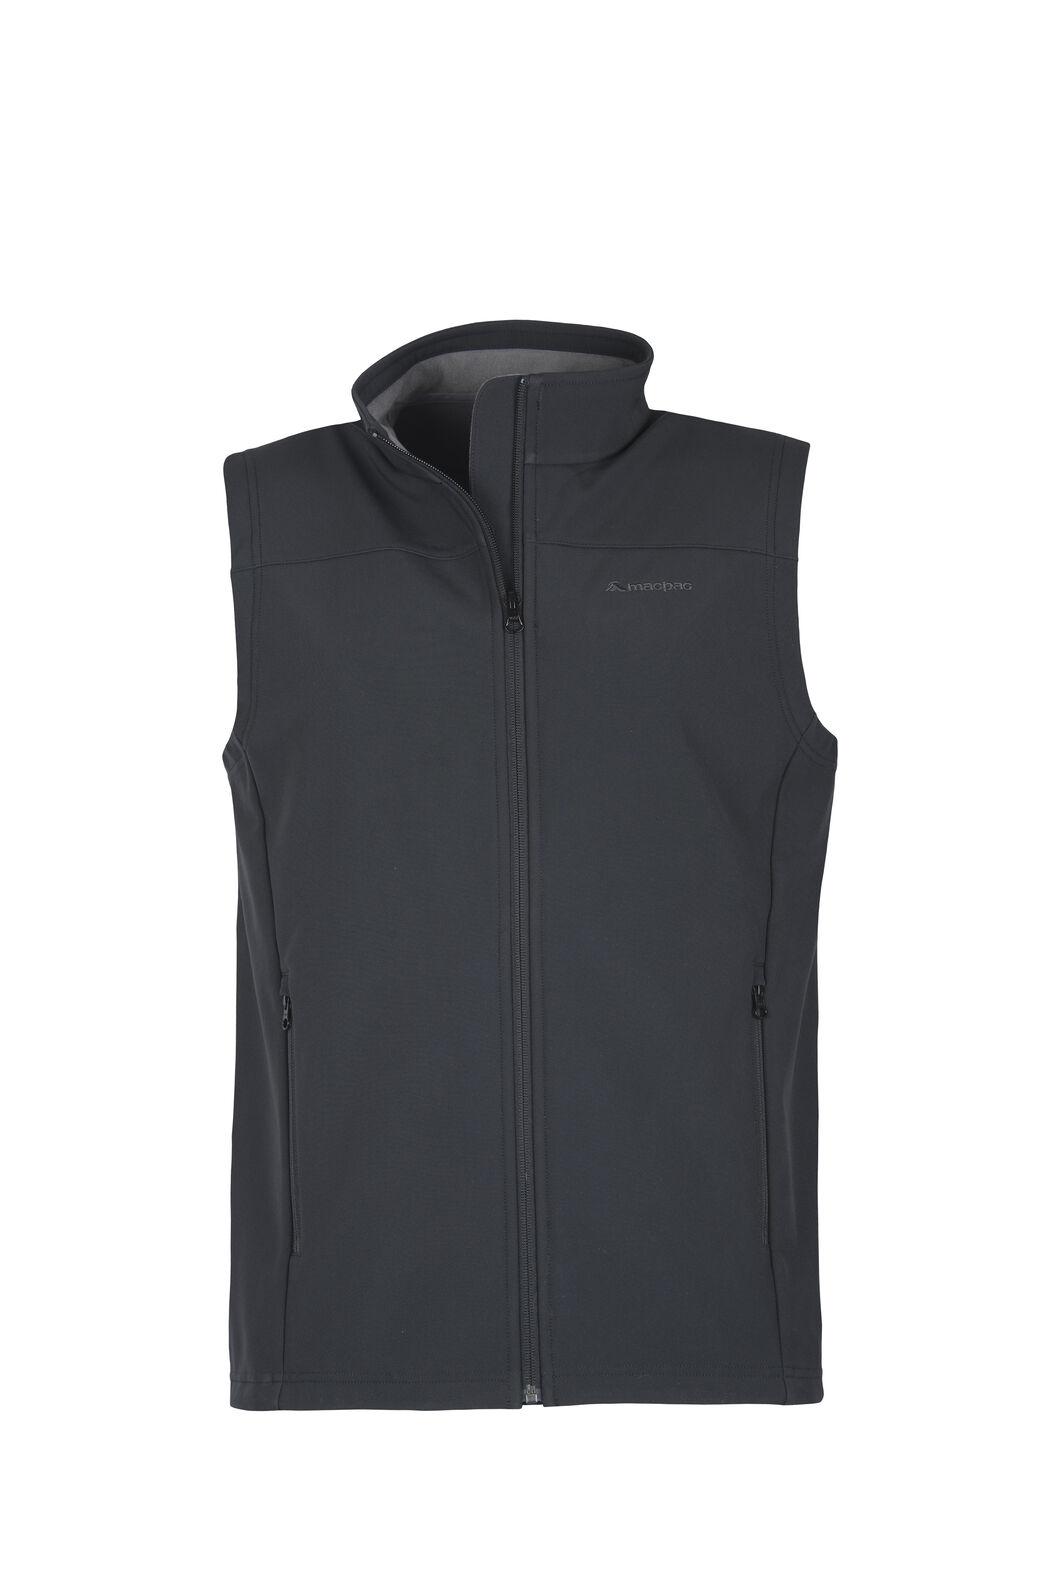 Macpac Men's Sabre Softshell Vest, Black, hi-res